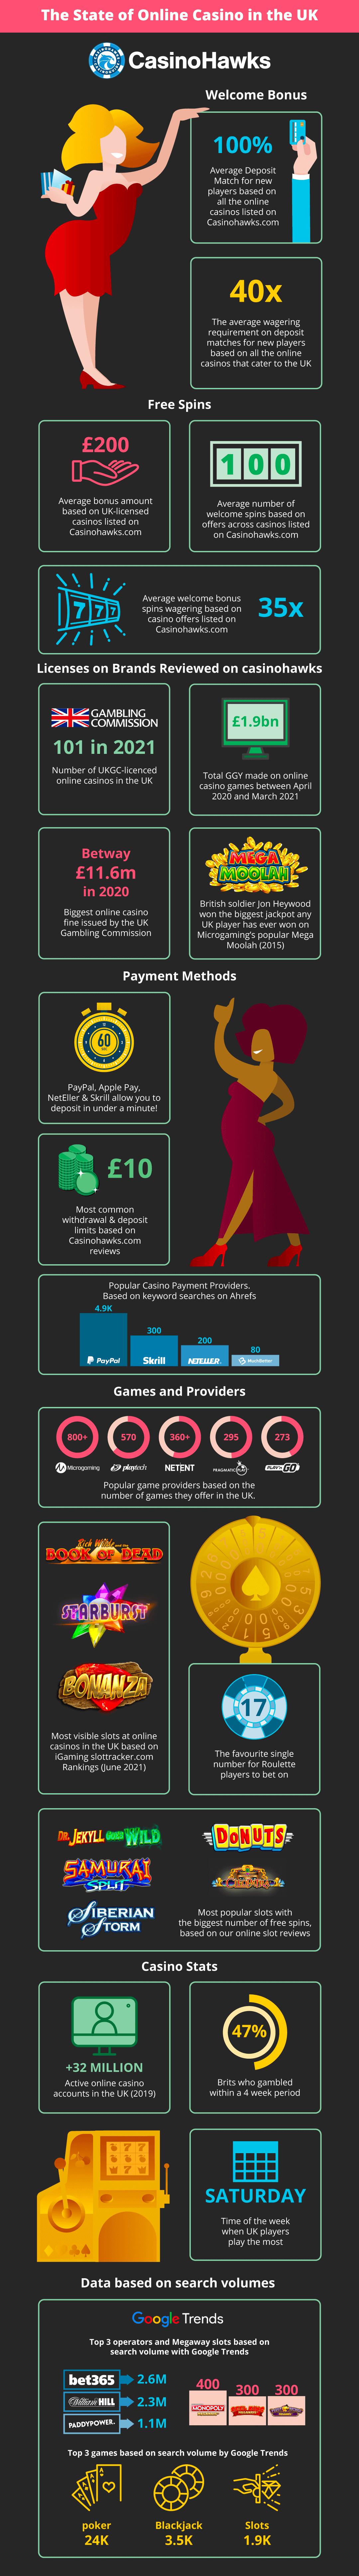 online casino UK infographic